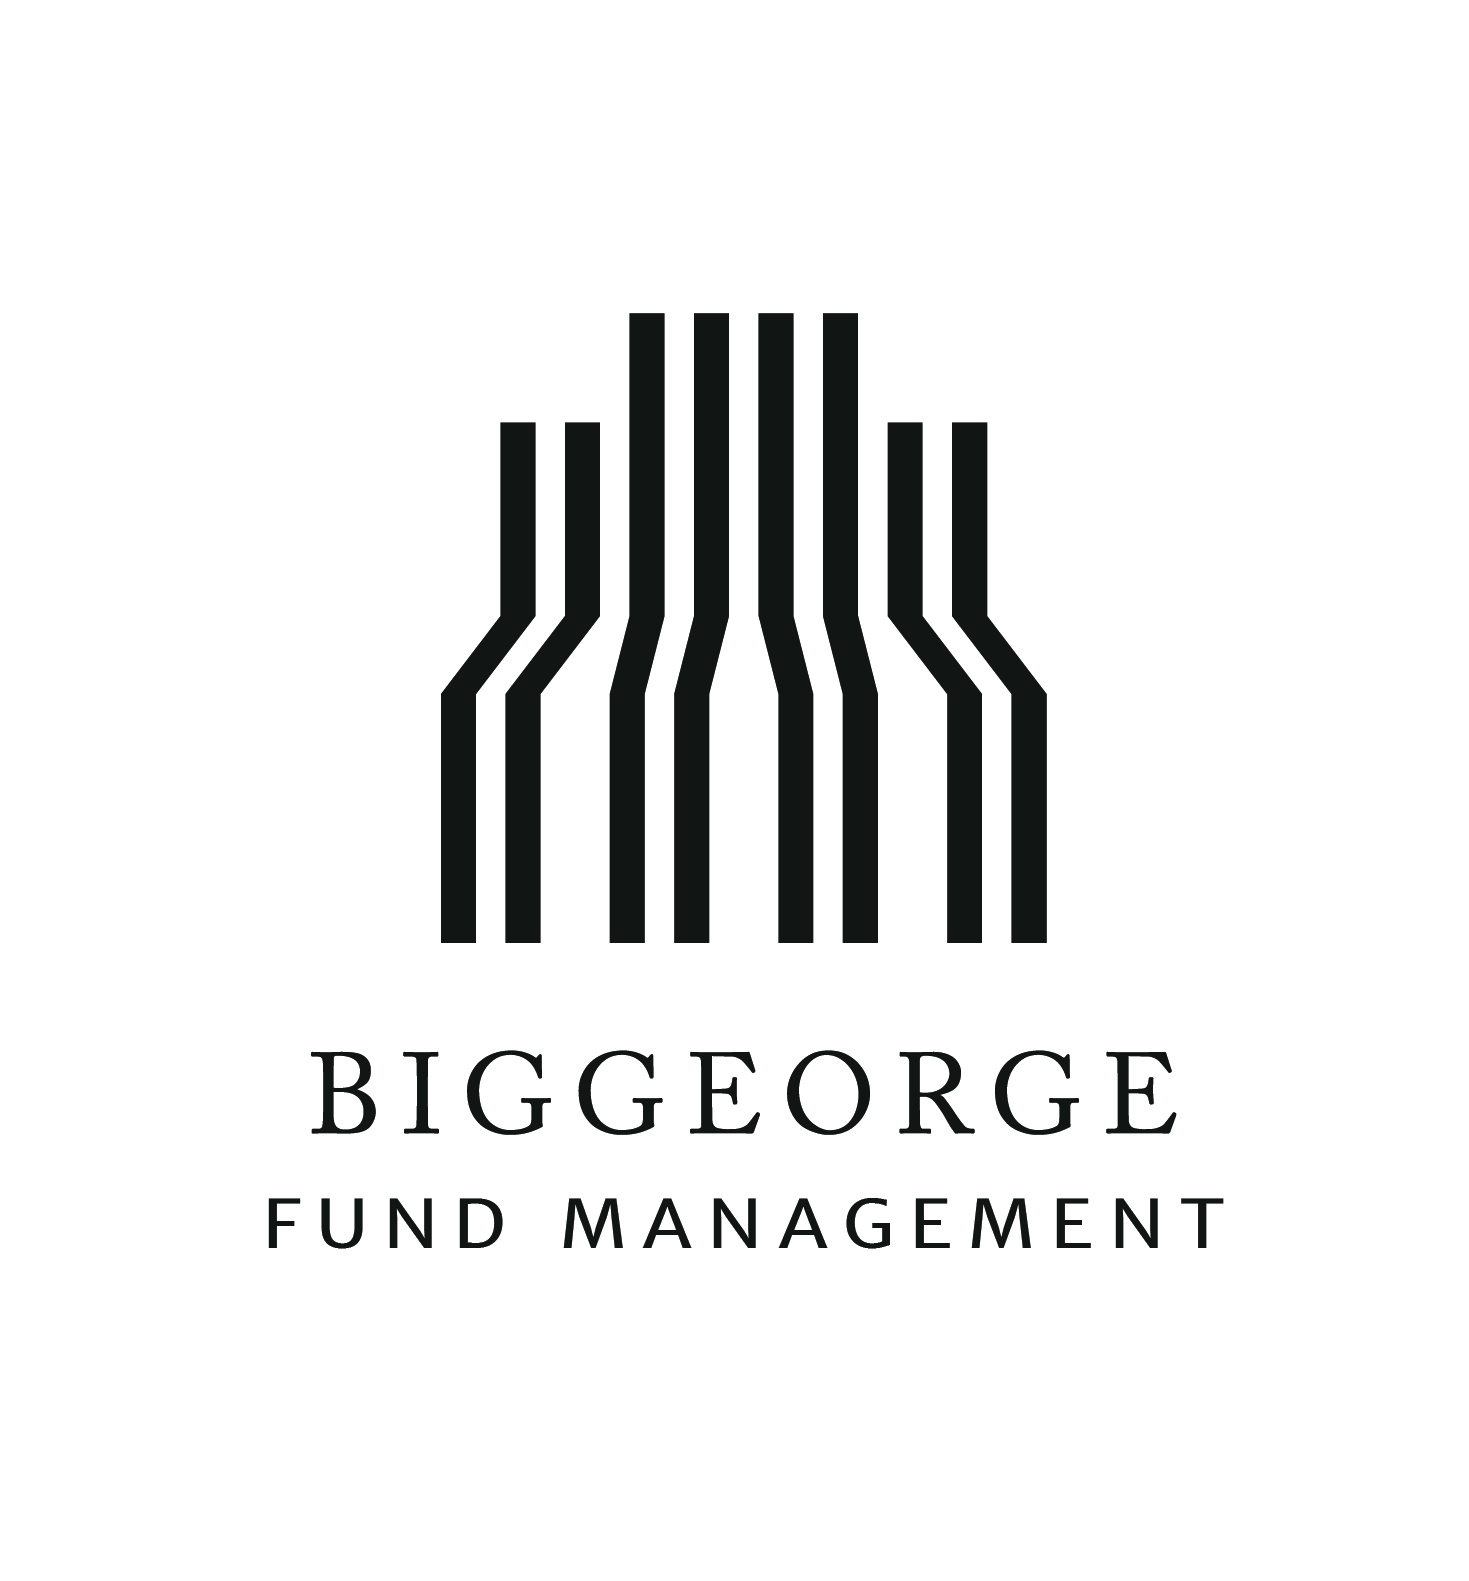 logo_ol_fund_management